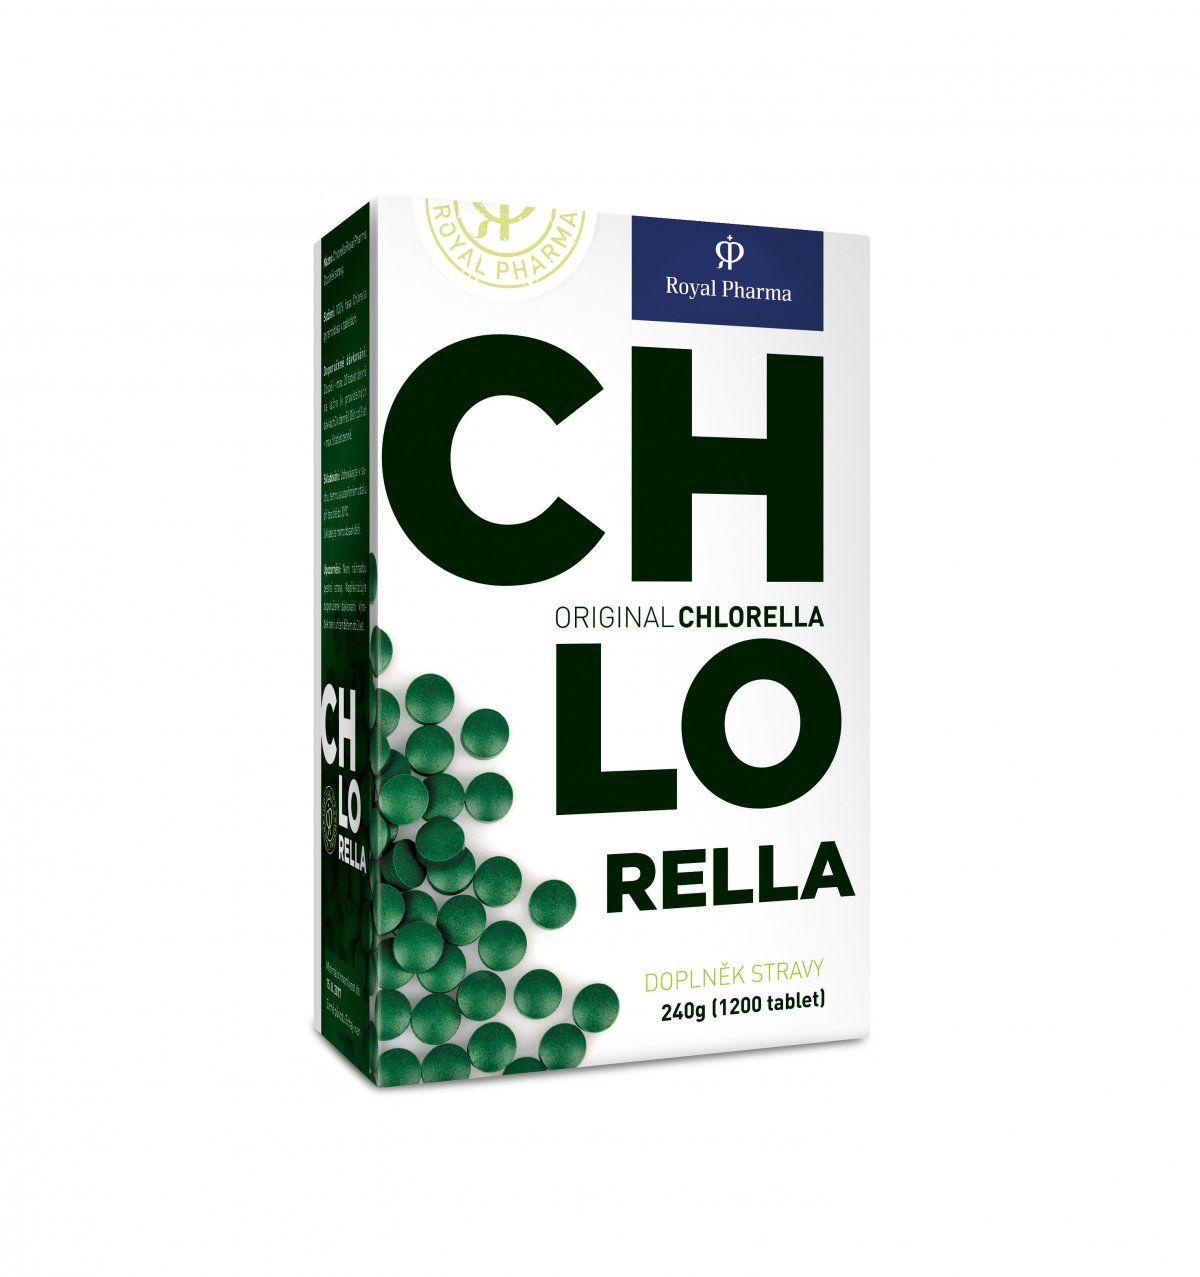 Chlorella Royal Pharma Počet tablet: 1200 tablet